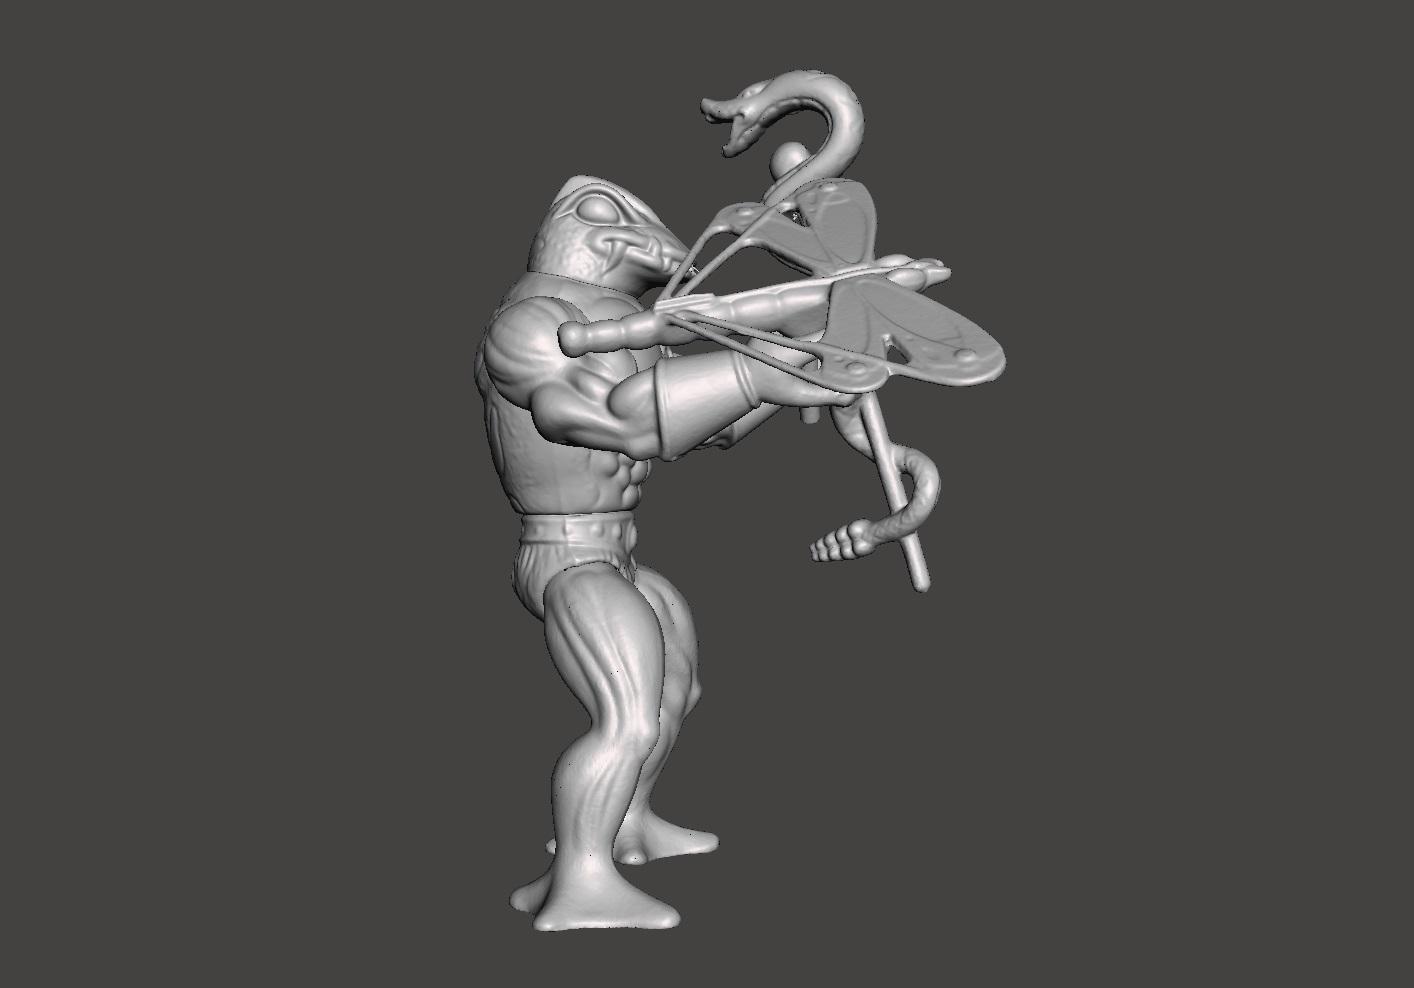 04_TUNG_LASHOR.jpg Download STL file TUNG LASHOR MOTU VINTAGE ACTION FIGURE (COMPLETE) • 3D printer object, VintageToysMG